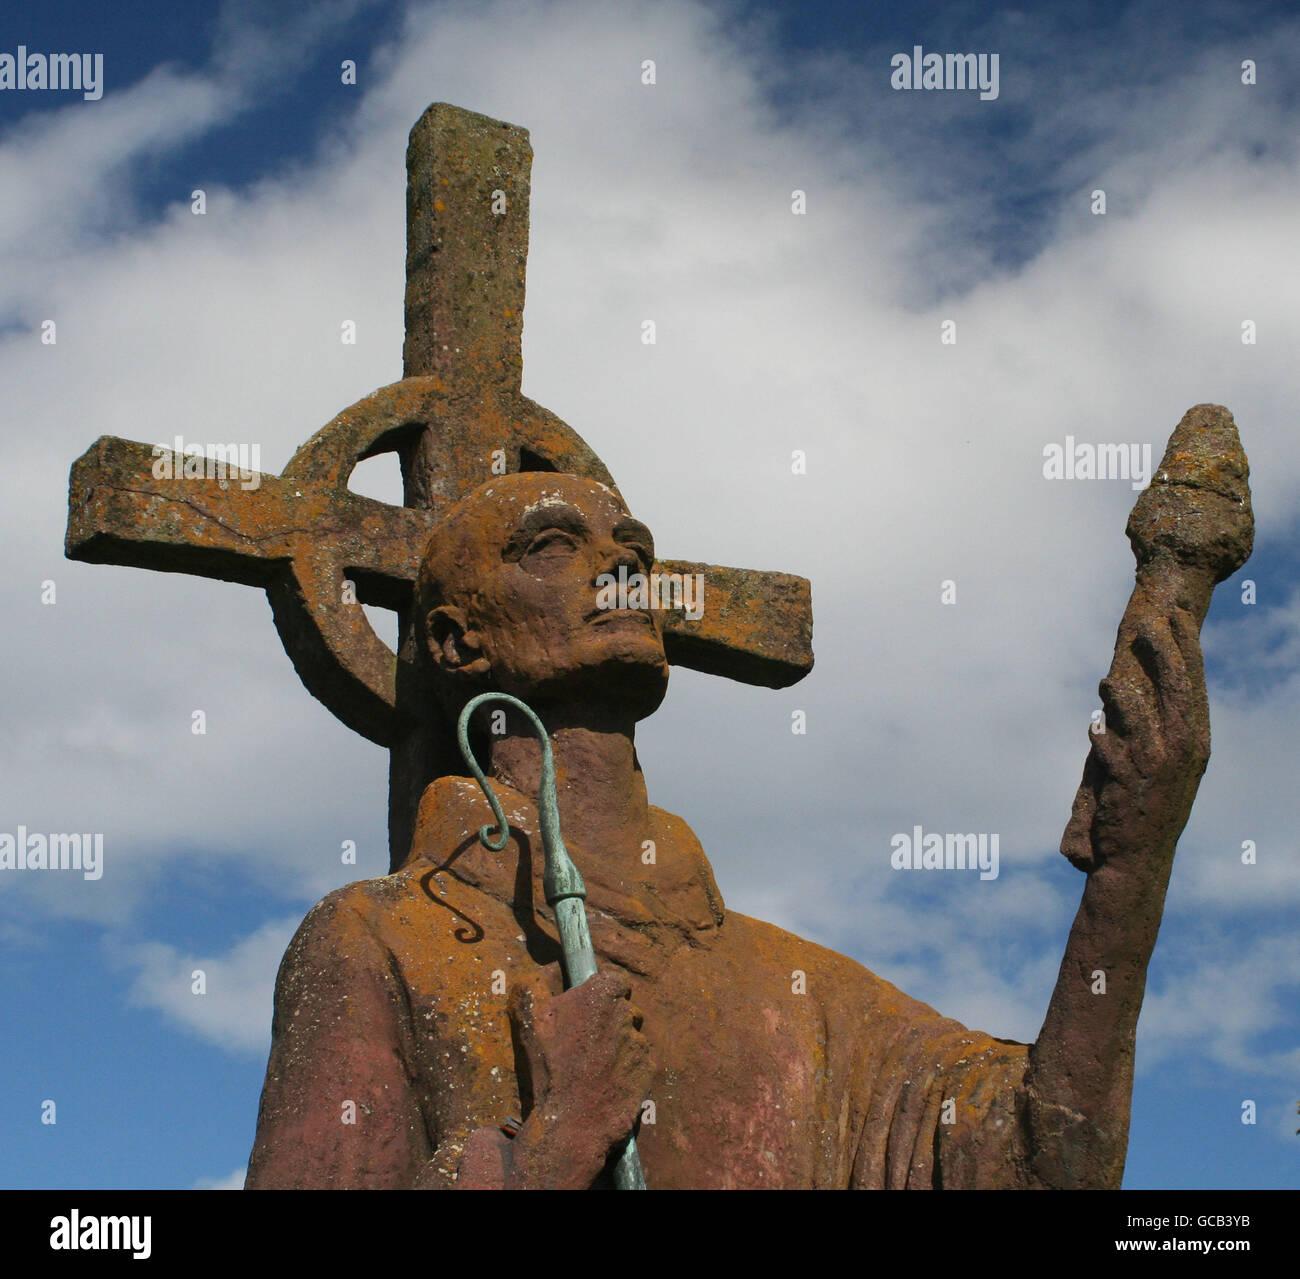 Estatua de San Aidan Apóstol de Northumbria Foto de stock